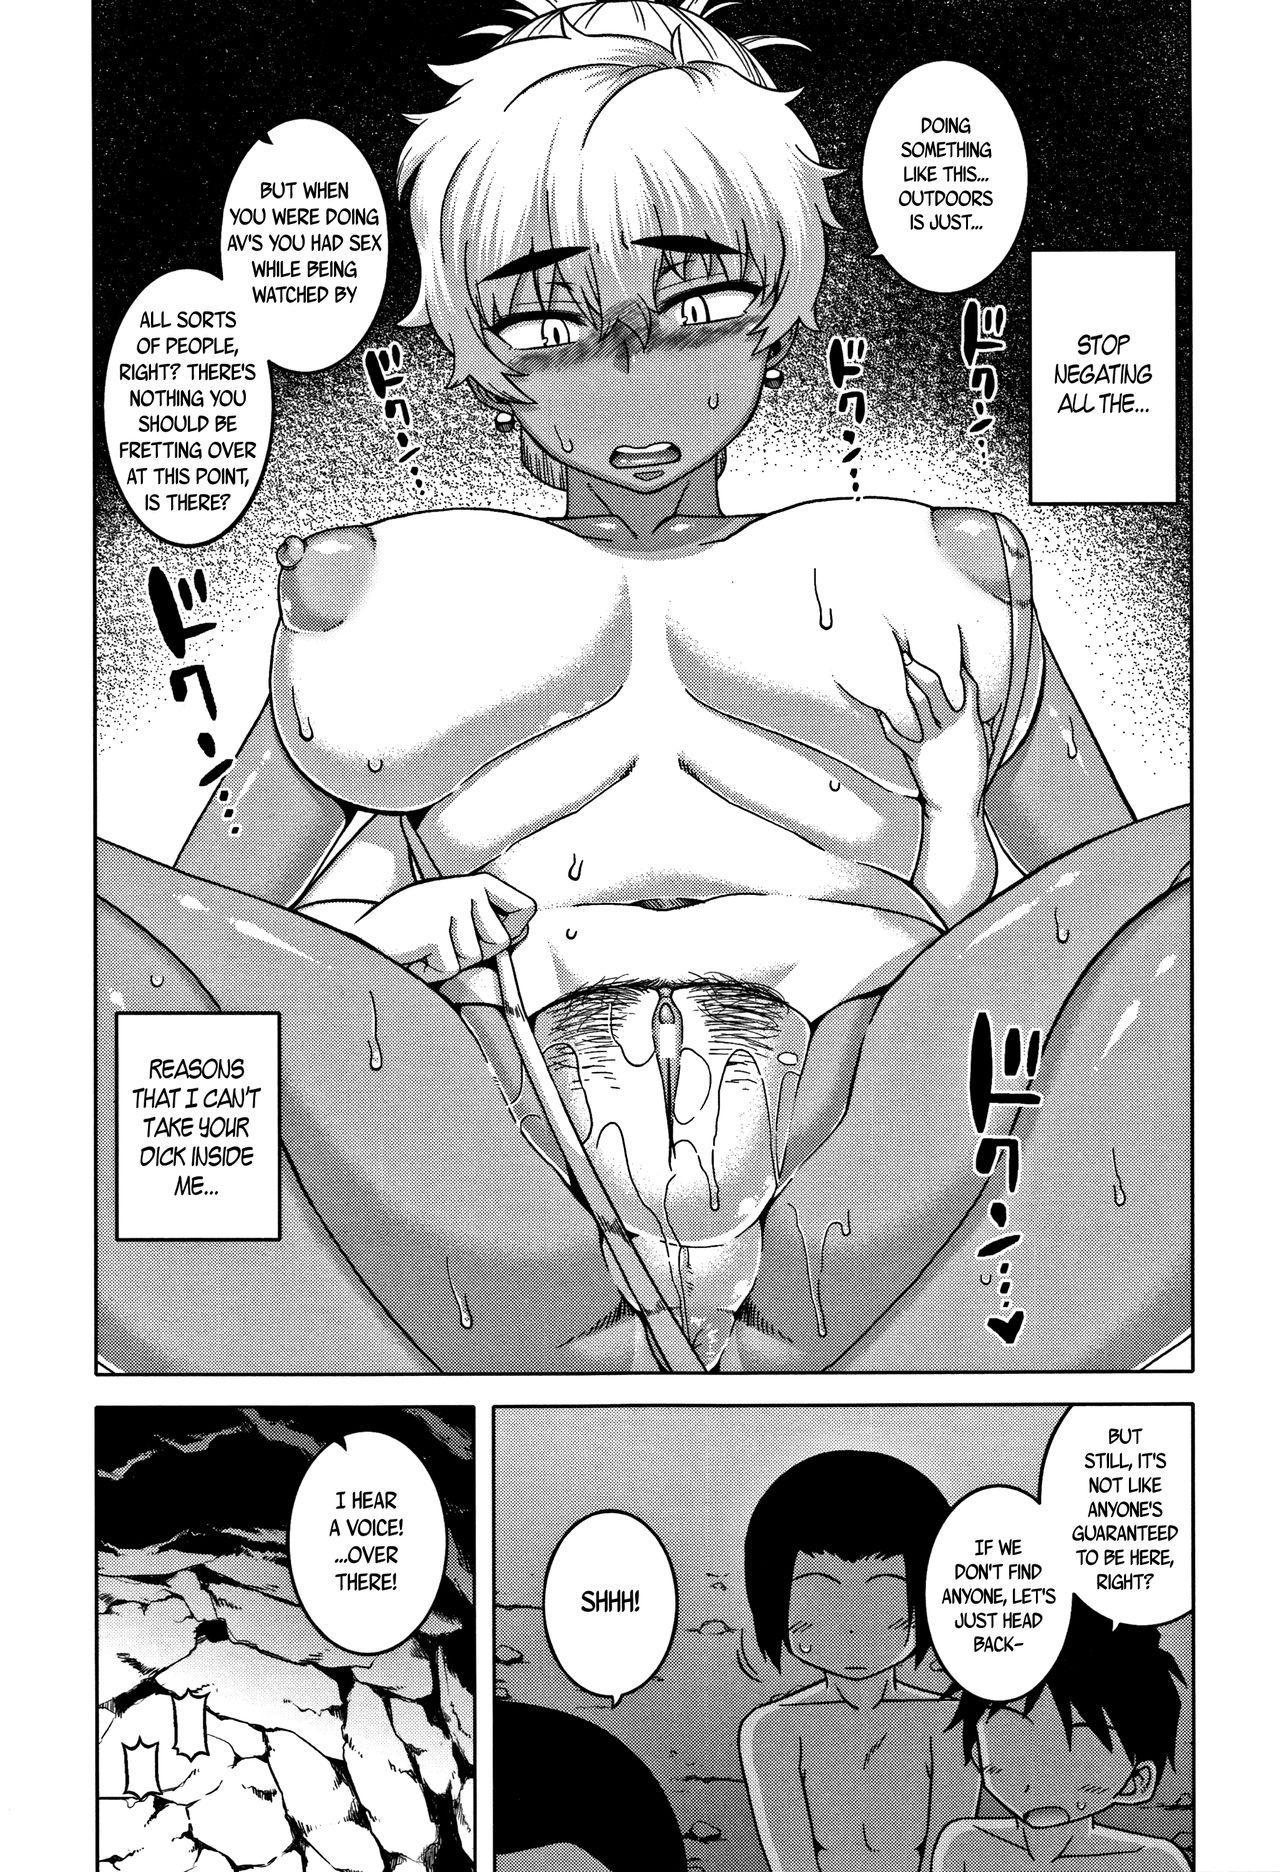 [Takatsu] Hitozuma A-san to Musuko no Yuujin N-kun - Married wife A and son's friend N-kun [English] 61